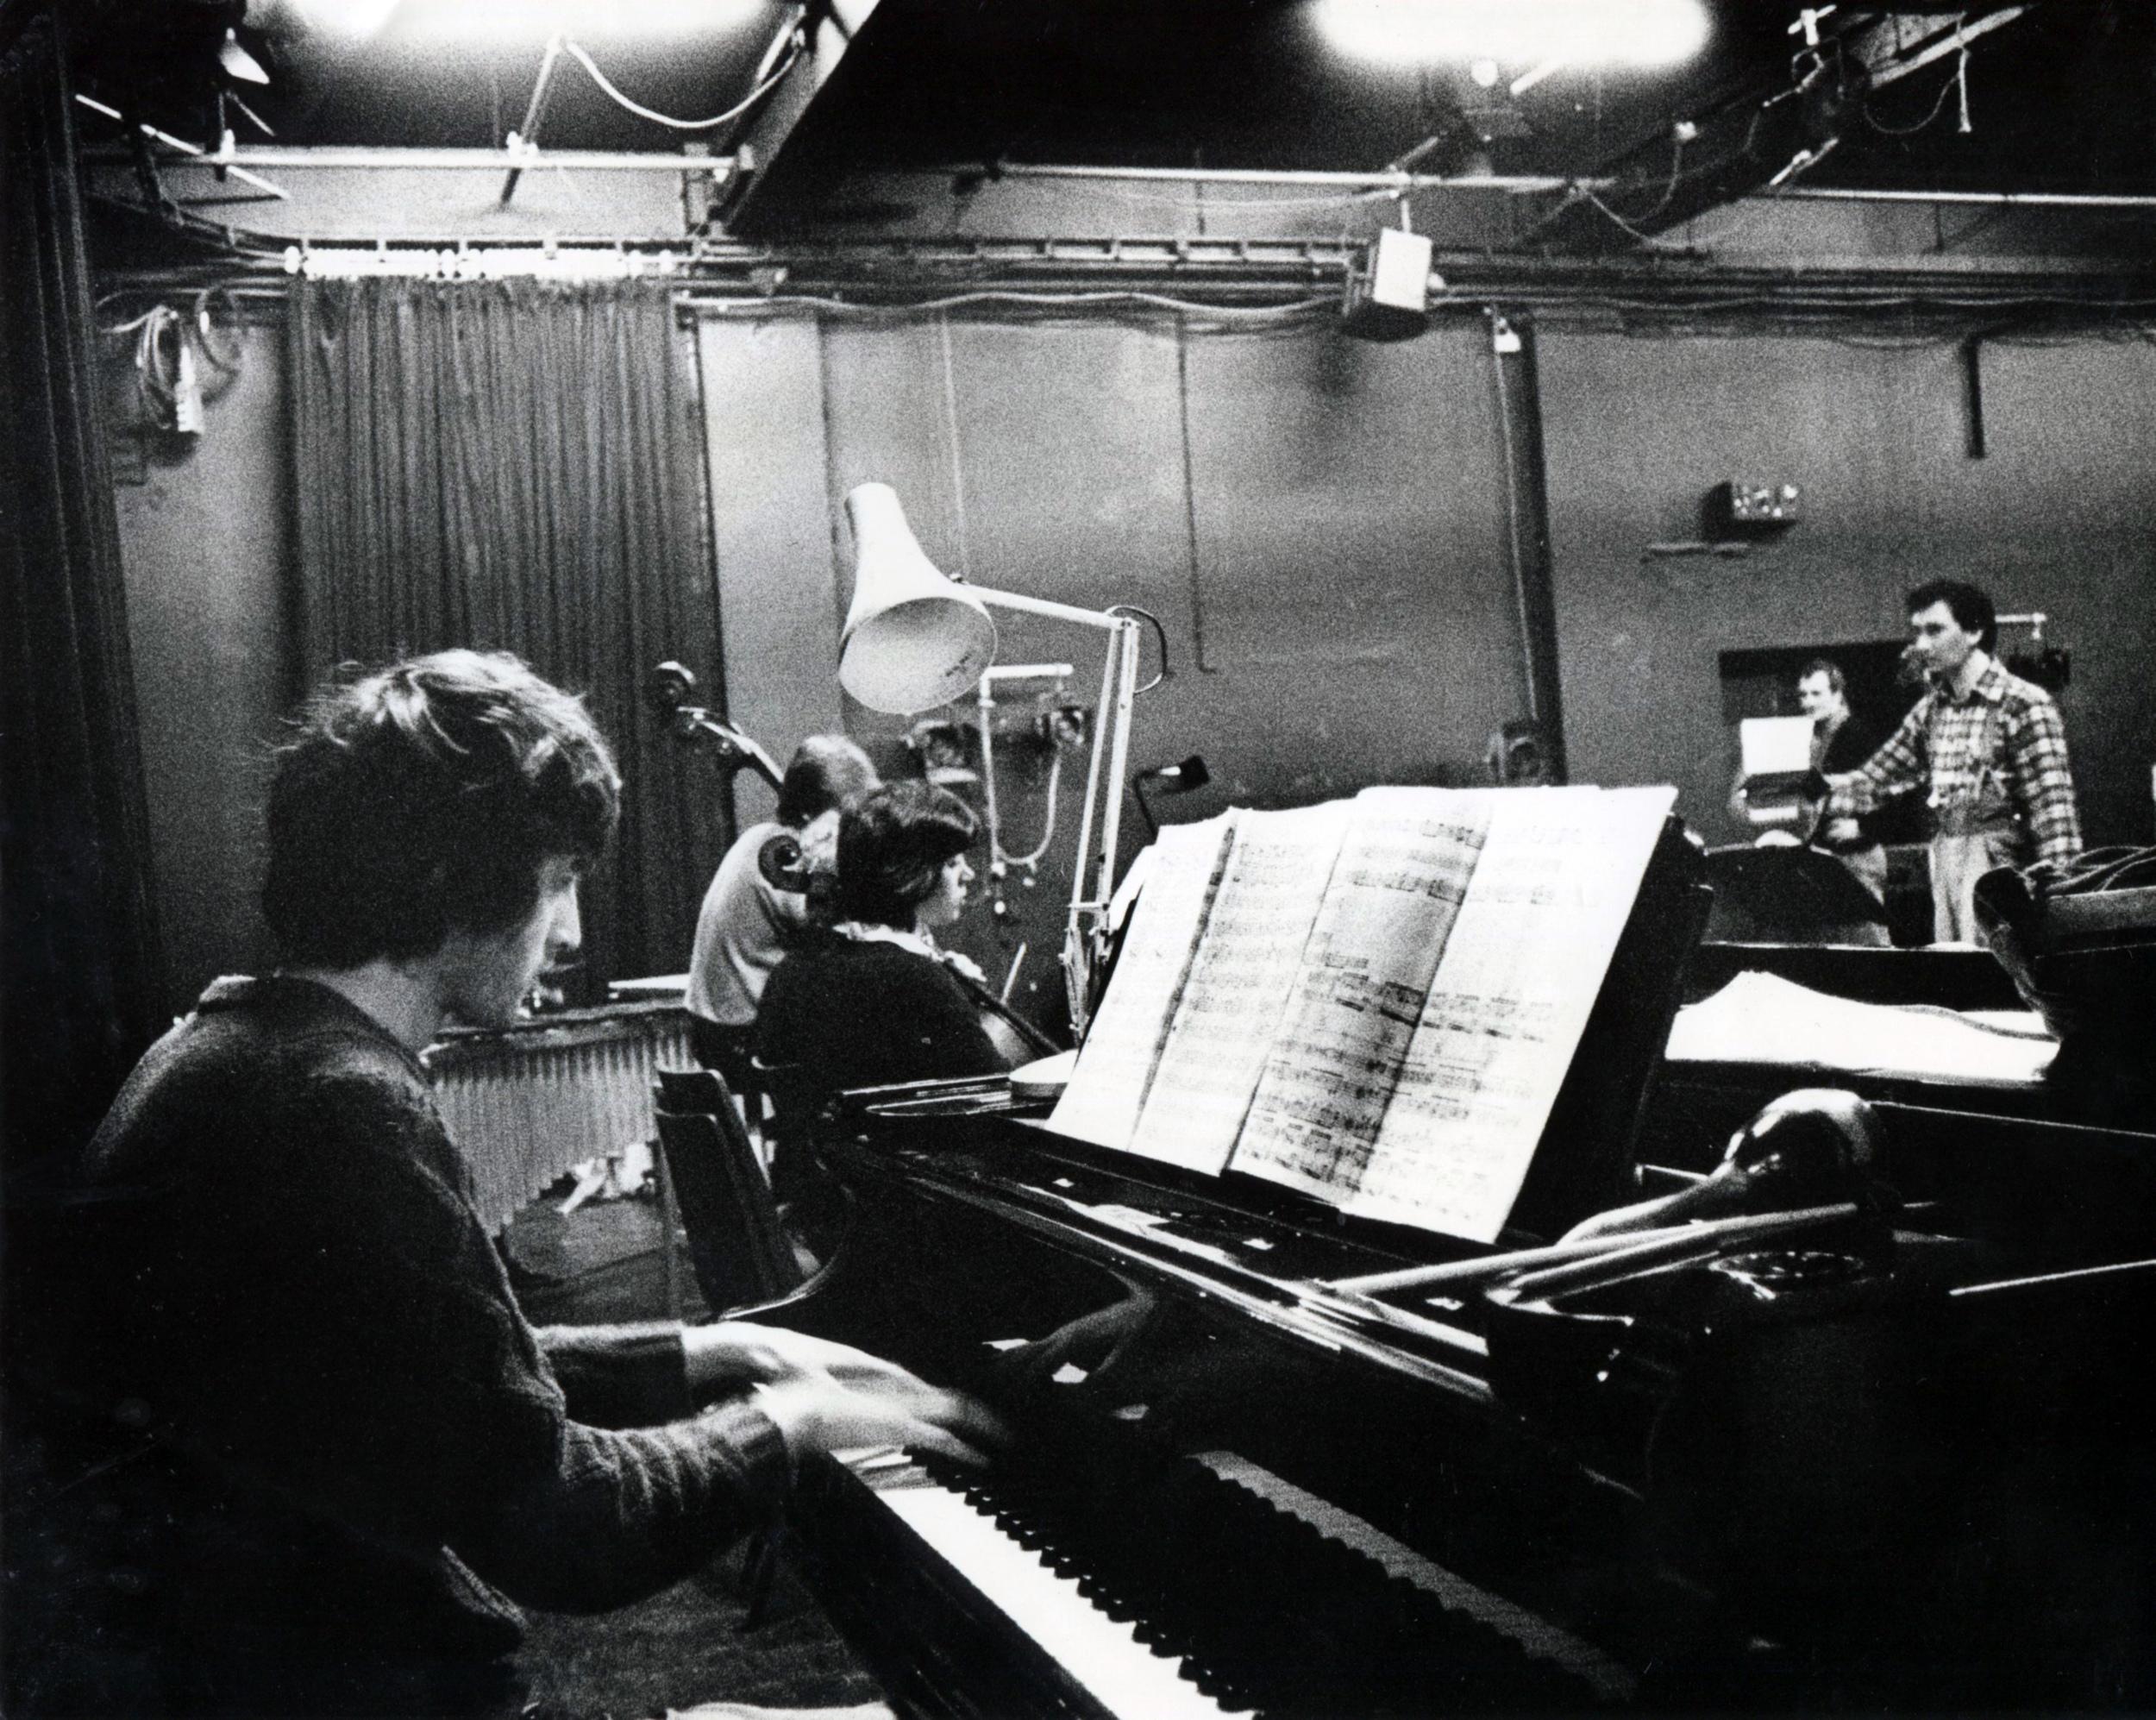 1983 Concert of Theatre & Music (Andrew Poppy) new.jpg